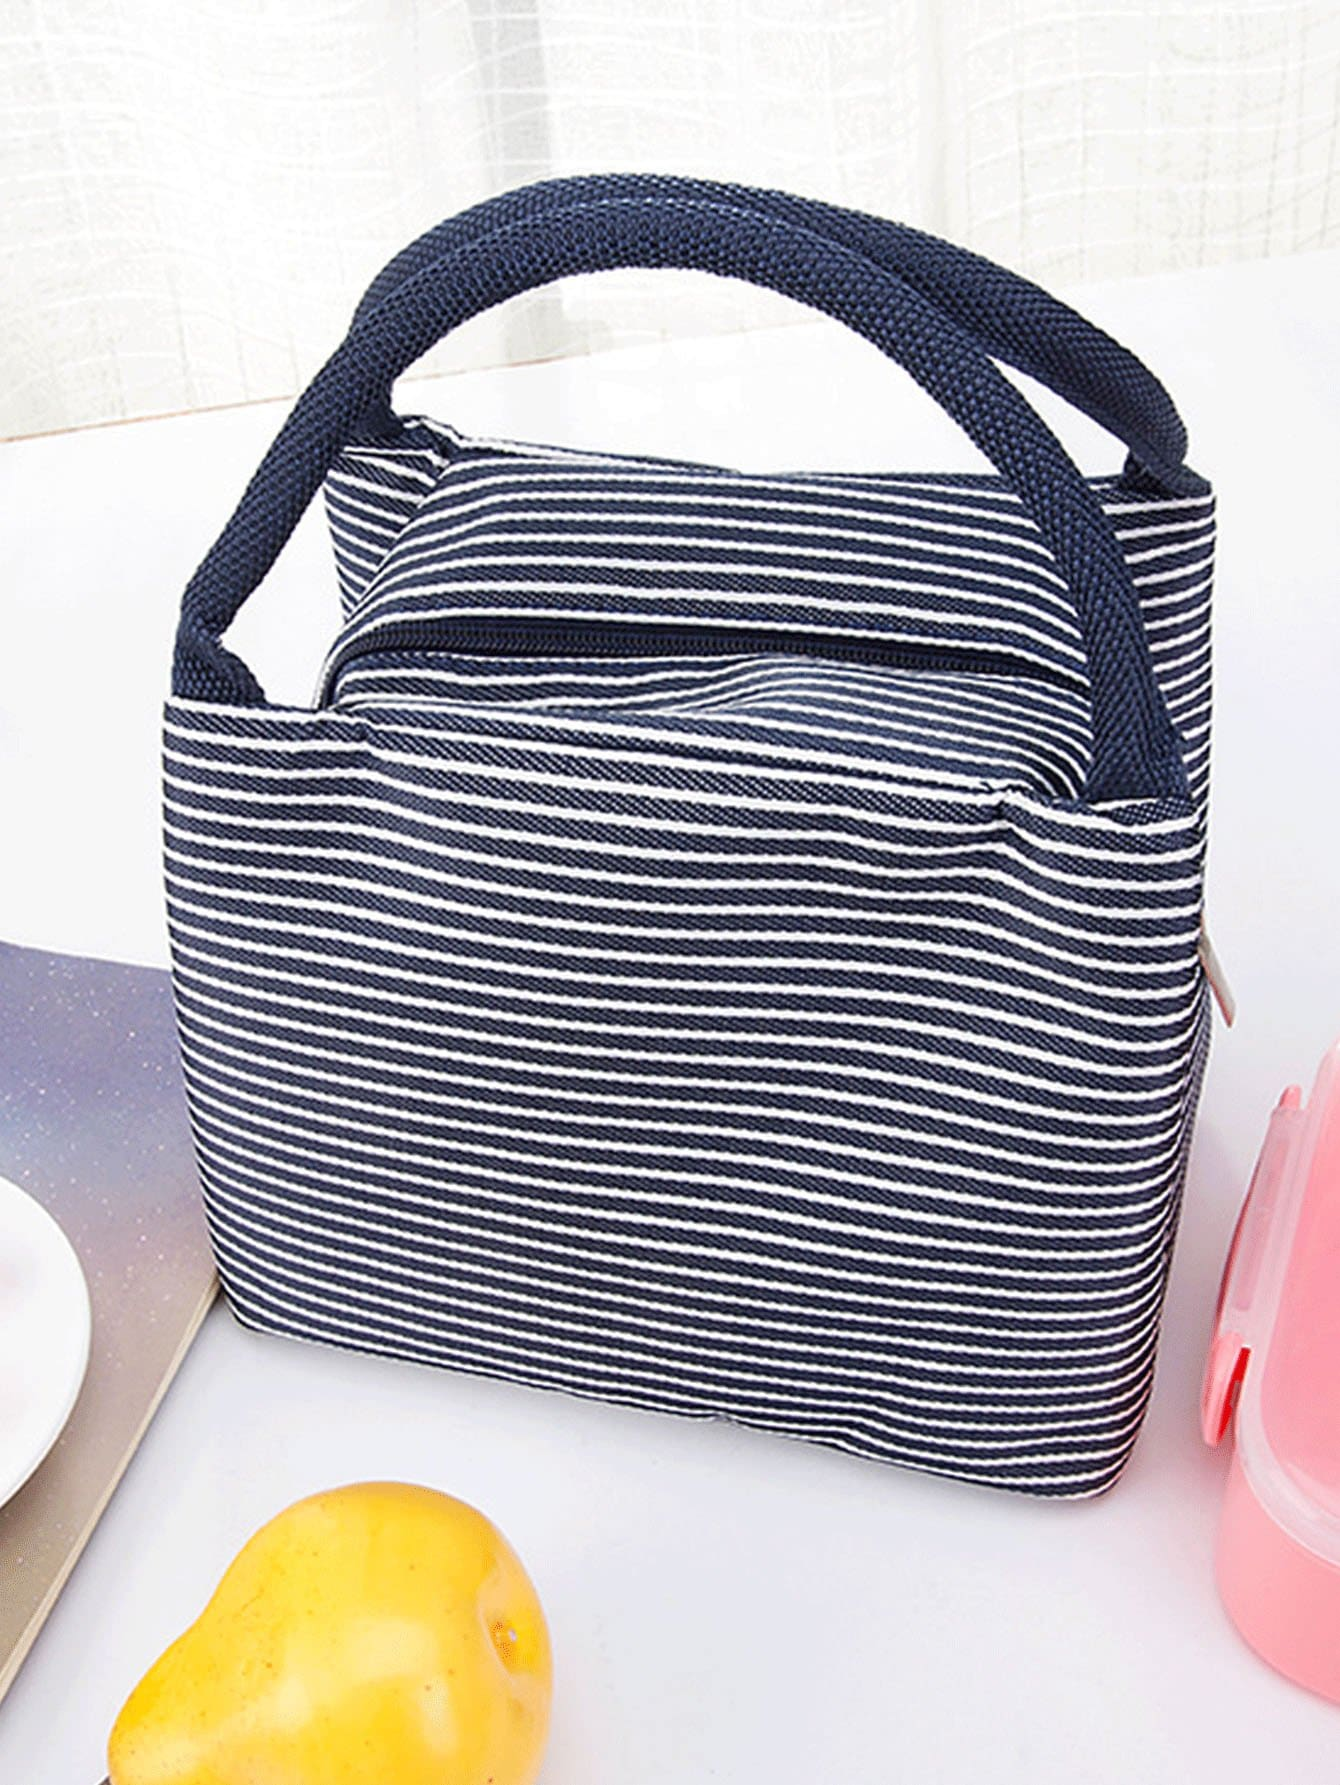 Striped Tote Lunch Bag striped tote lunch bag